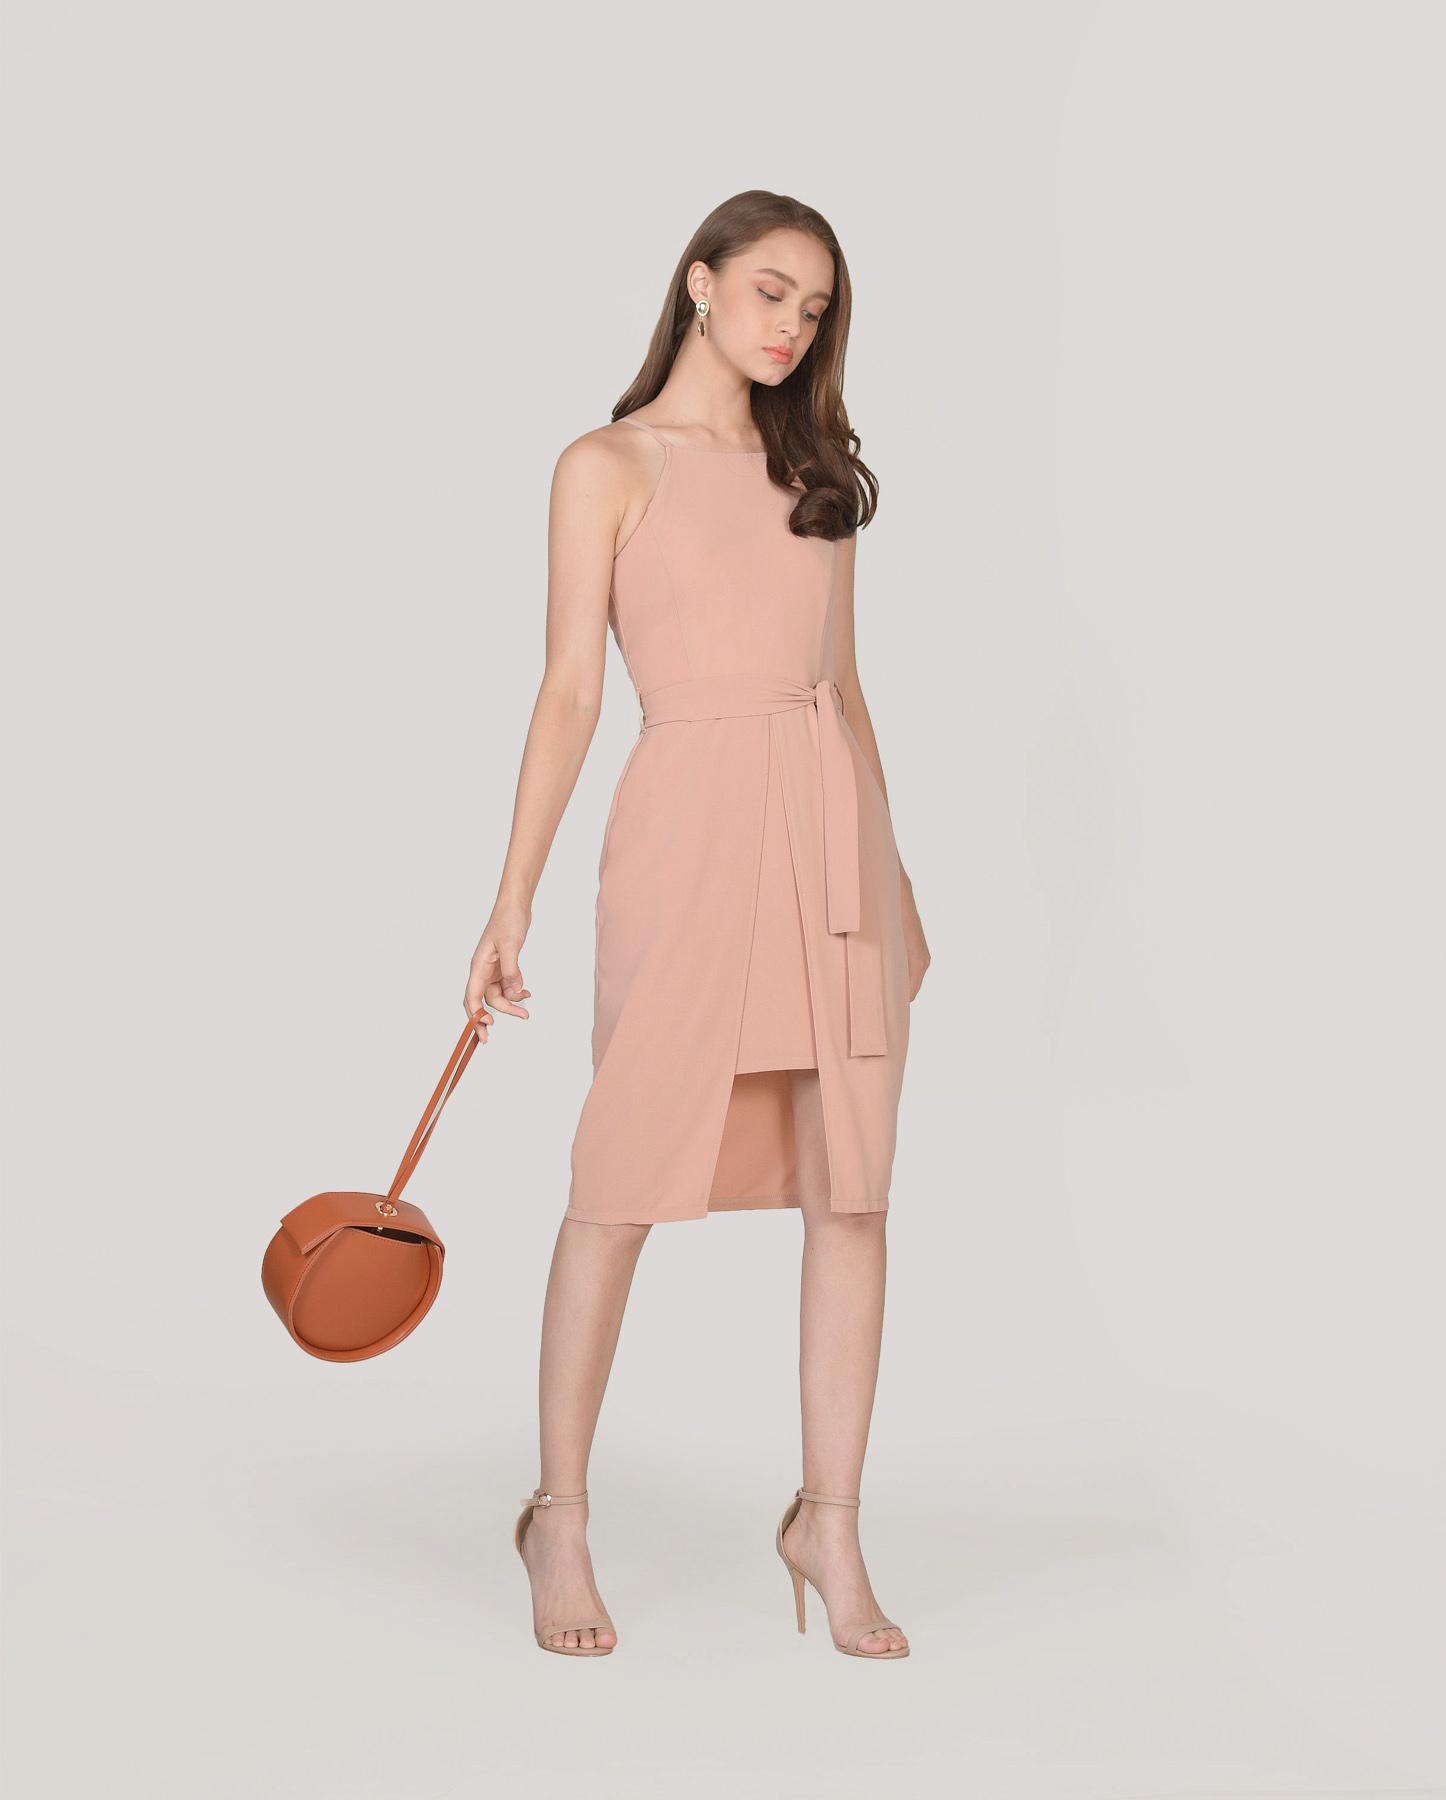 philosophy-dress-nude-pink-1